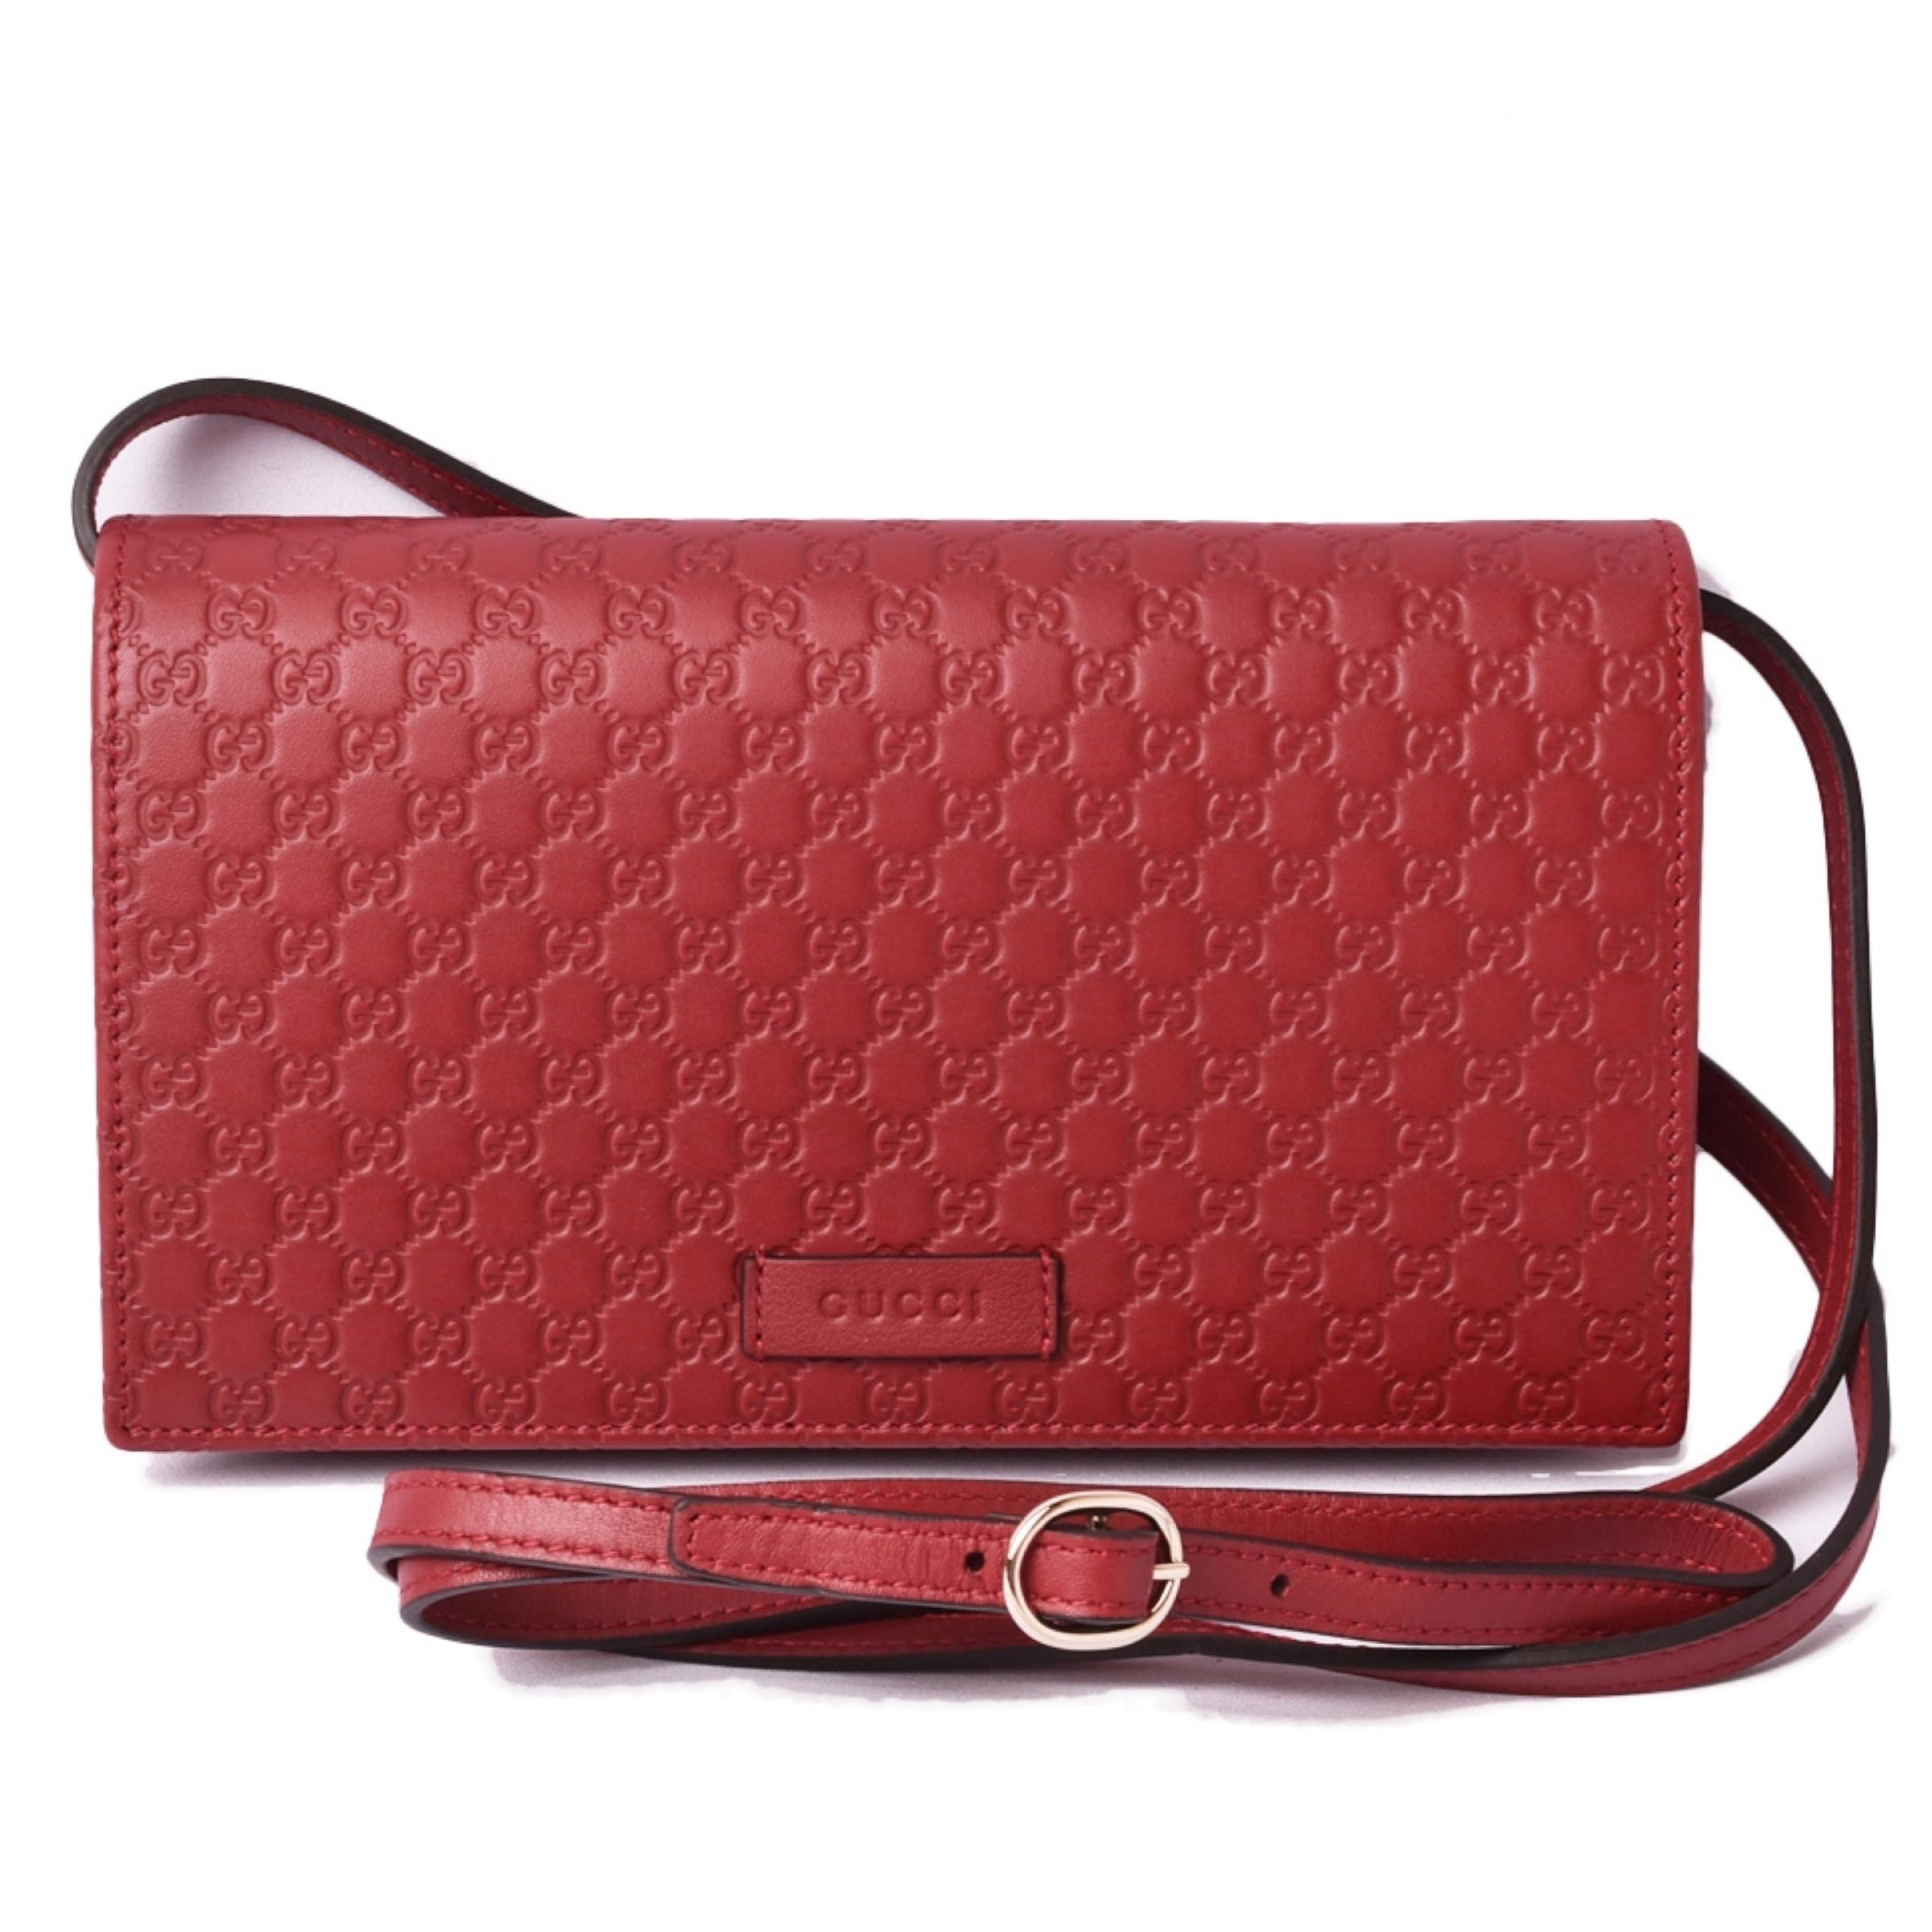 GUCCI NEW Gucci Red Leather Micro GG Guccissima Wallet Bag